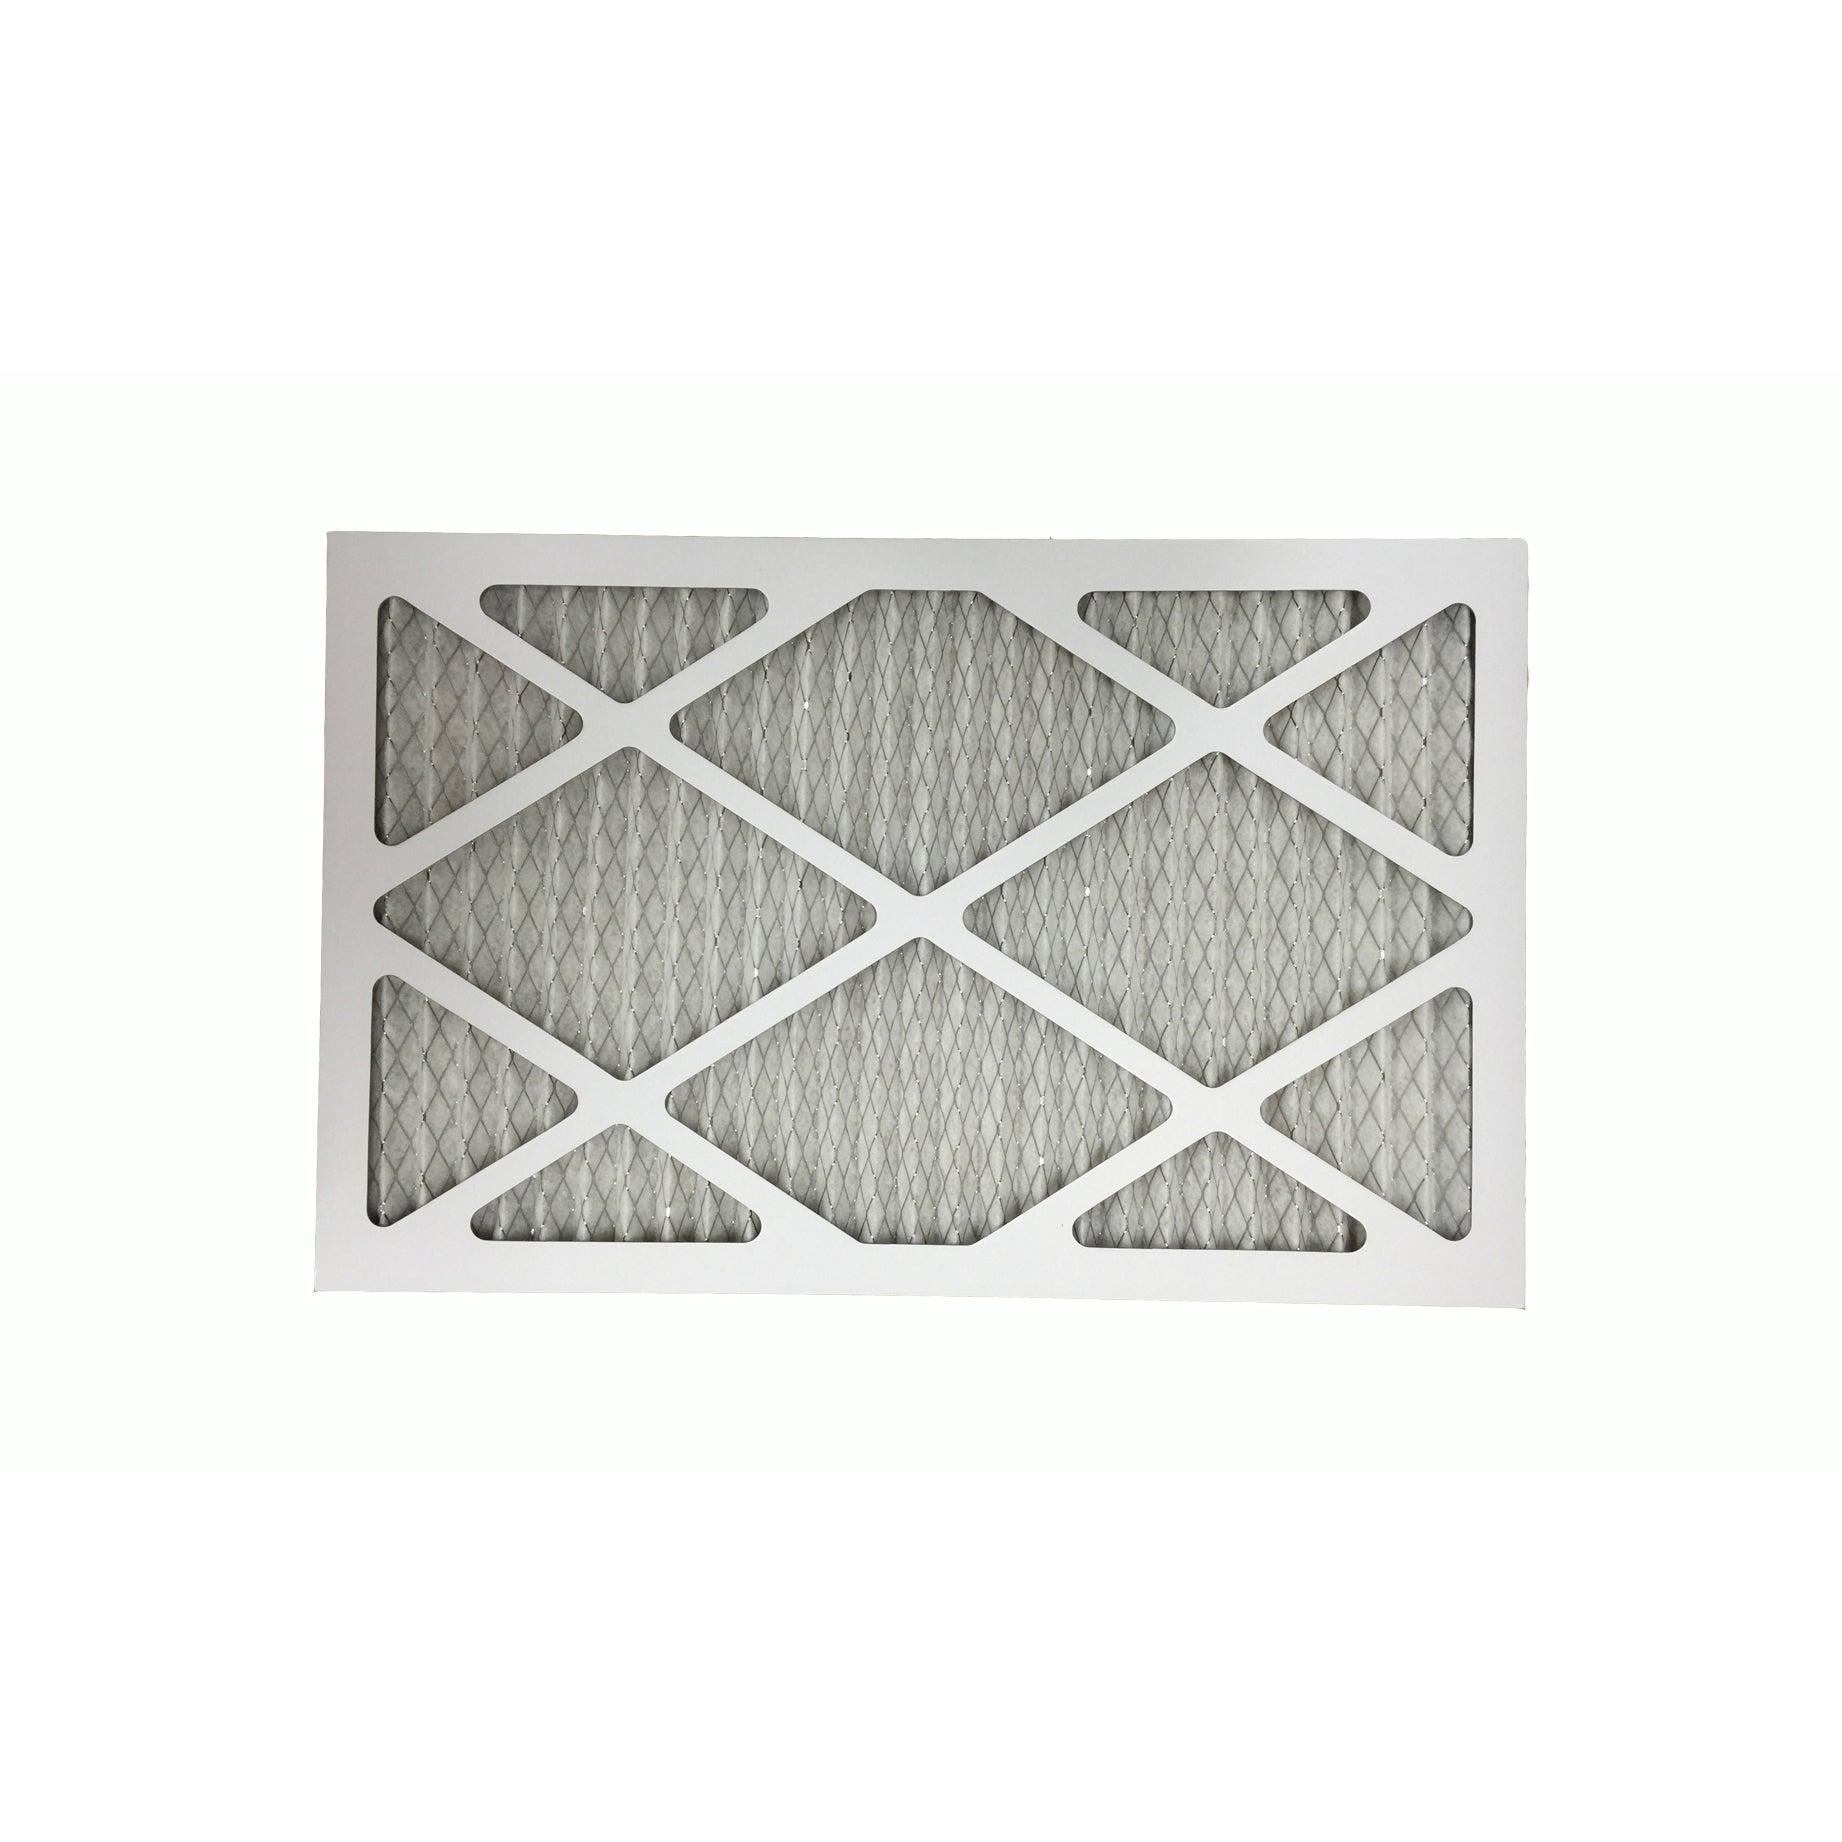 Crucial Merv 11 Allergen Air Furnace Filters 12x24x1 (air...